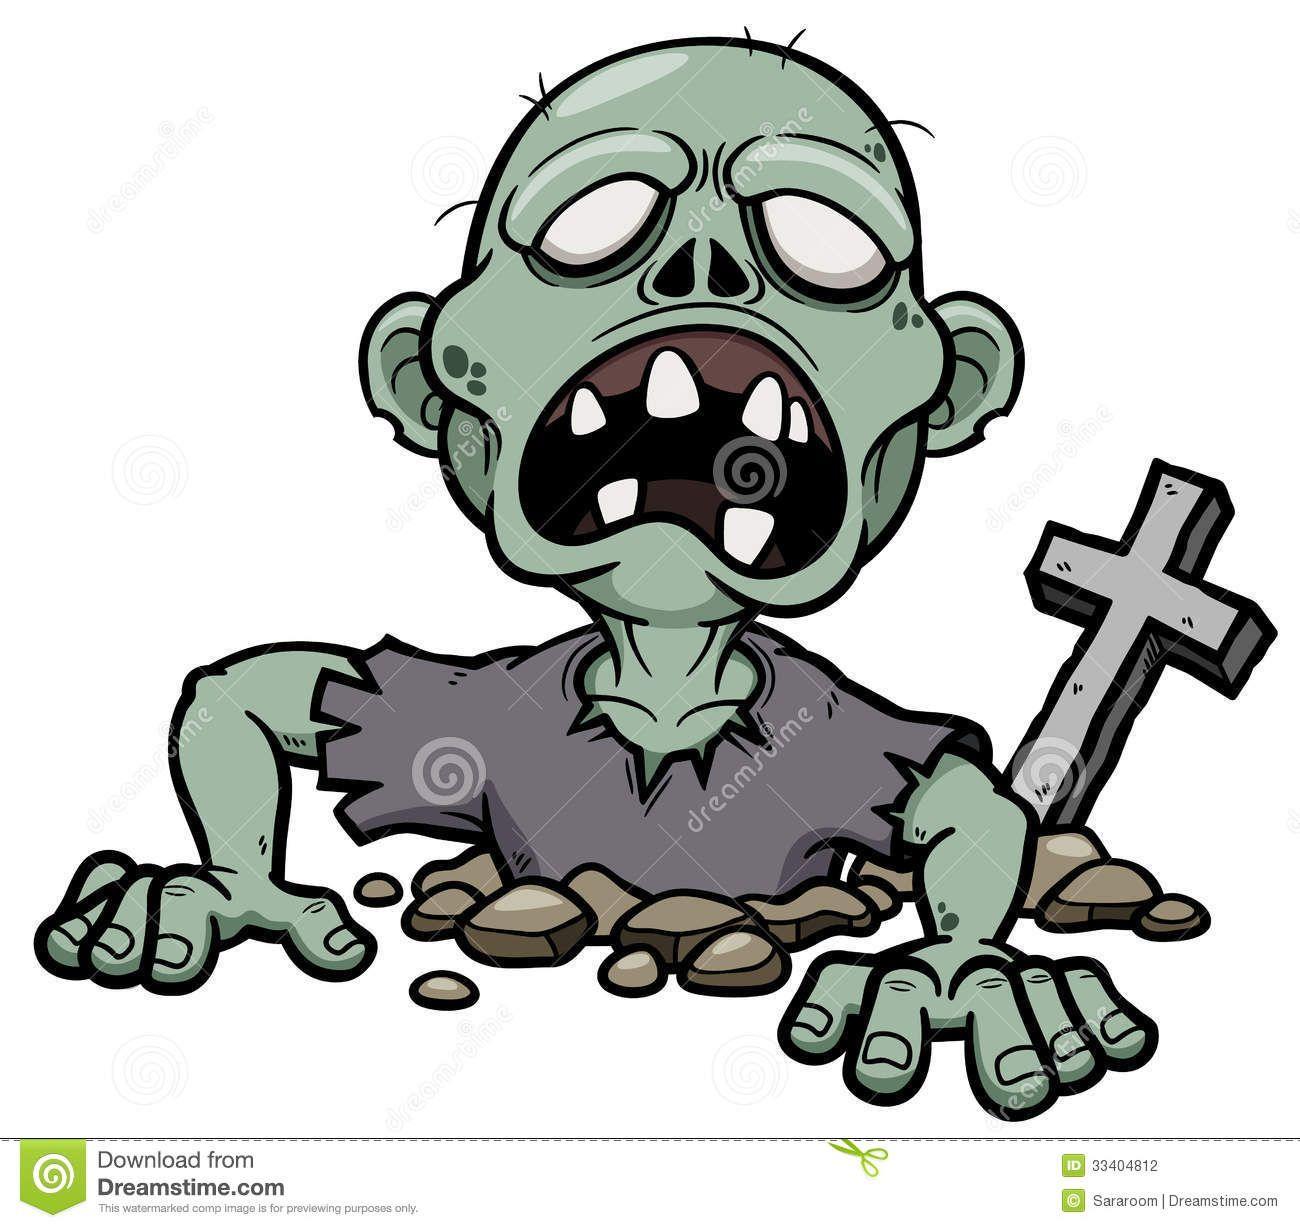 Cartoon Zombie Vector Illustration 33404812 Jpg 1300 1228 Zombie Cartoon Zombie Drawings Zombie Illustration